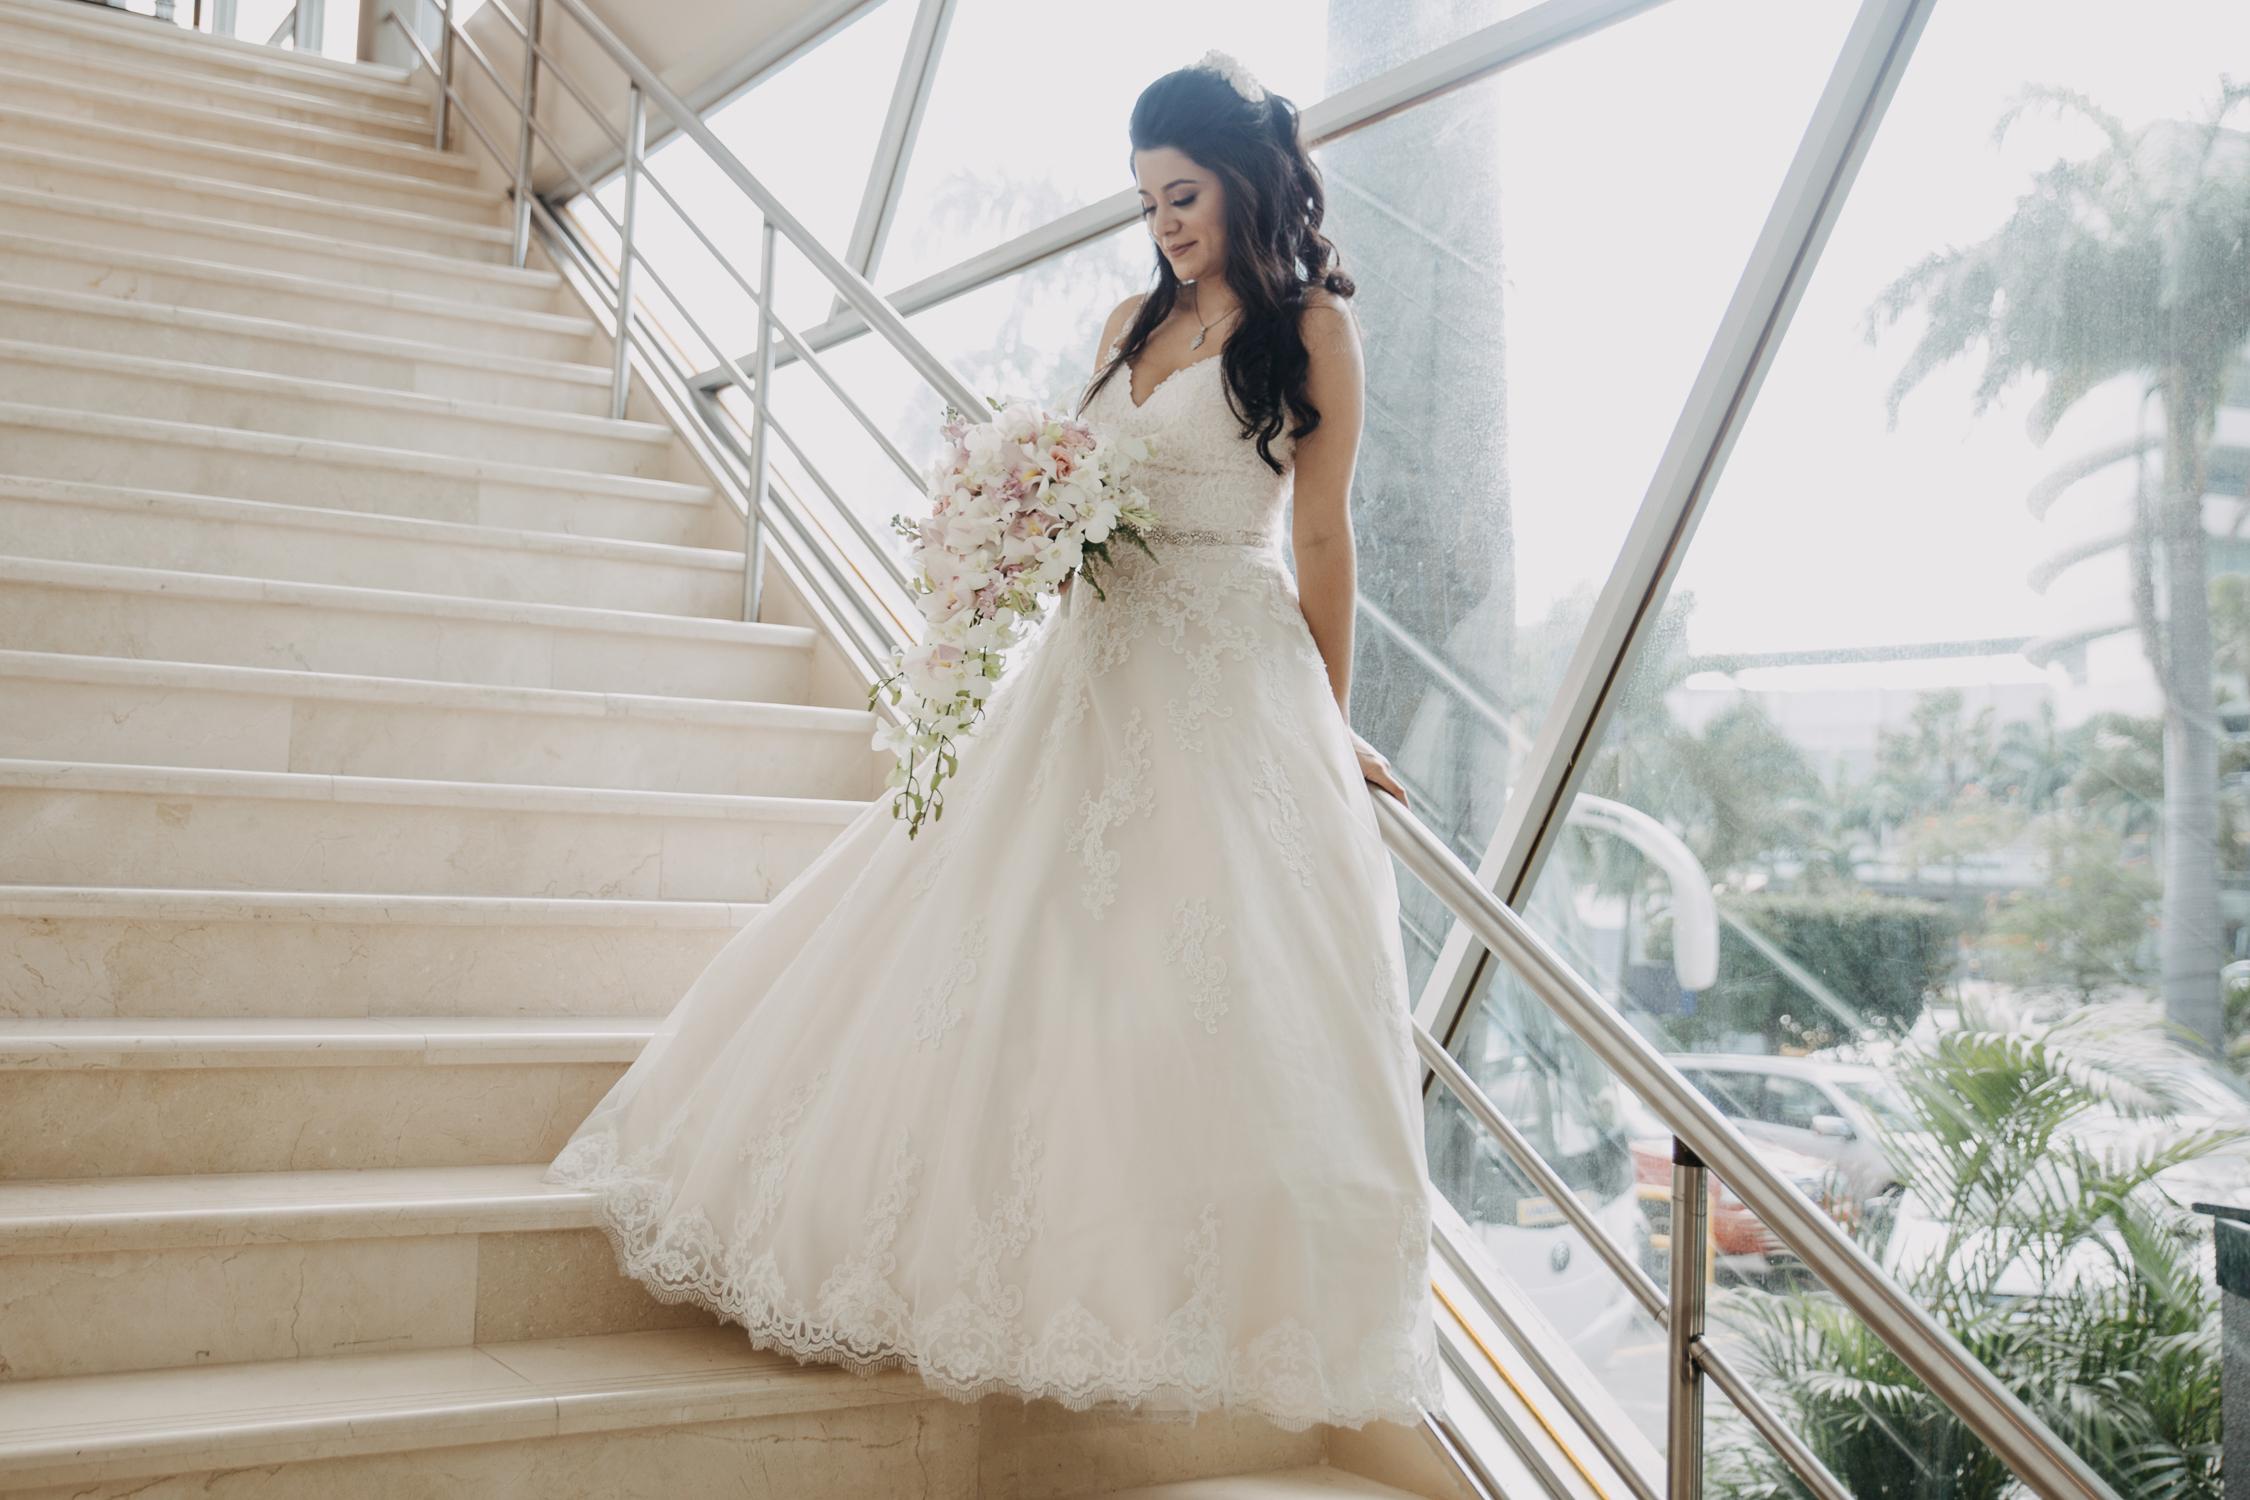 Michelle-Agurto-Fotografia-Bodas-Ecuador-Destination-Wedding-Photographer-Daniela-Dirk-79.JPG